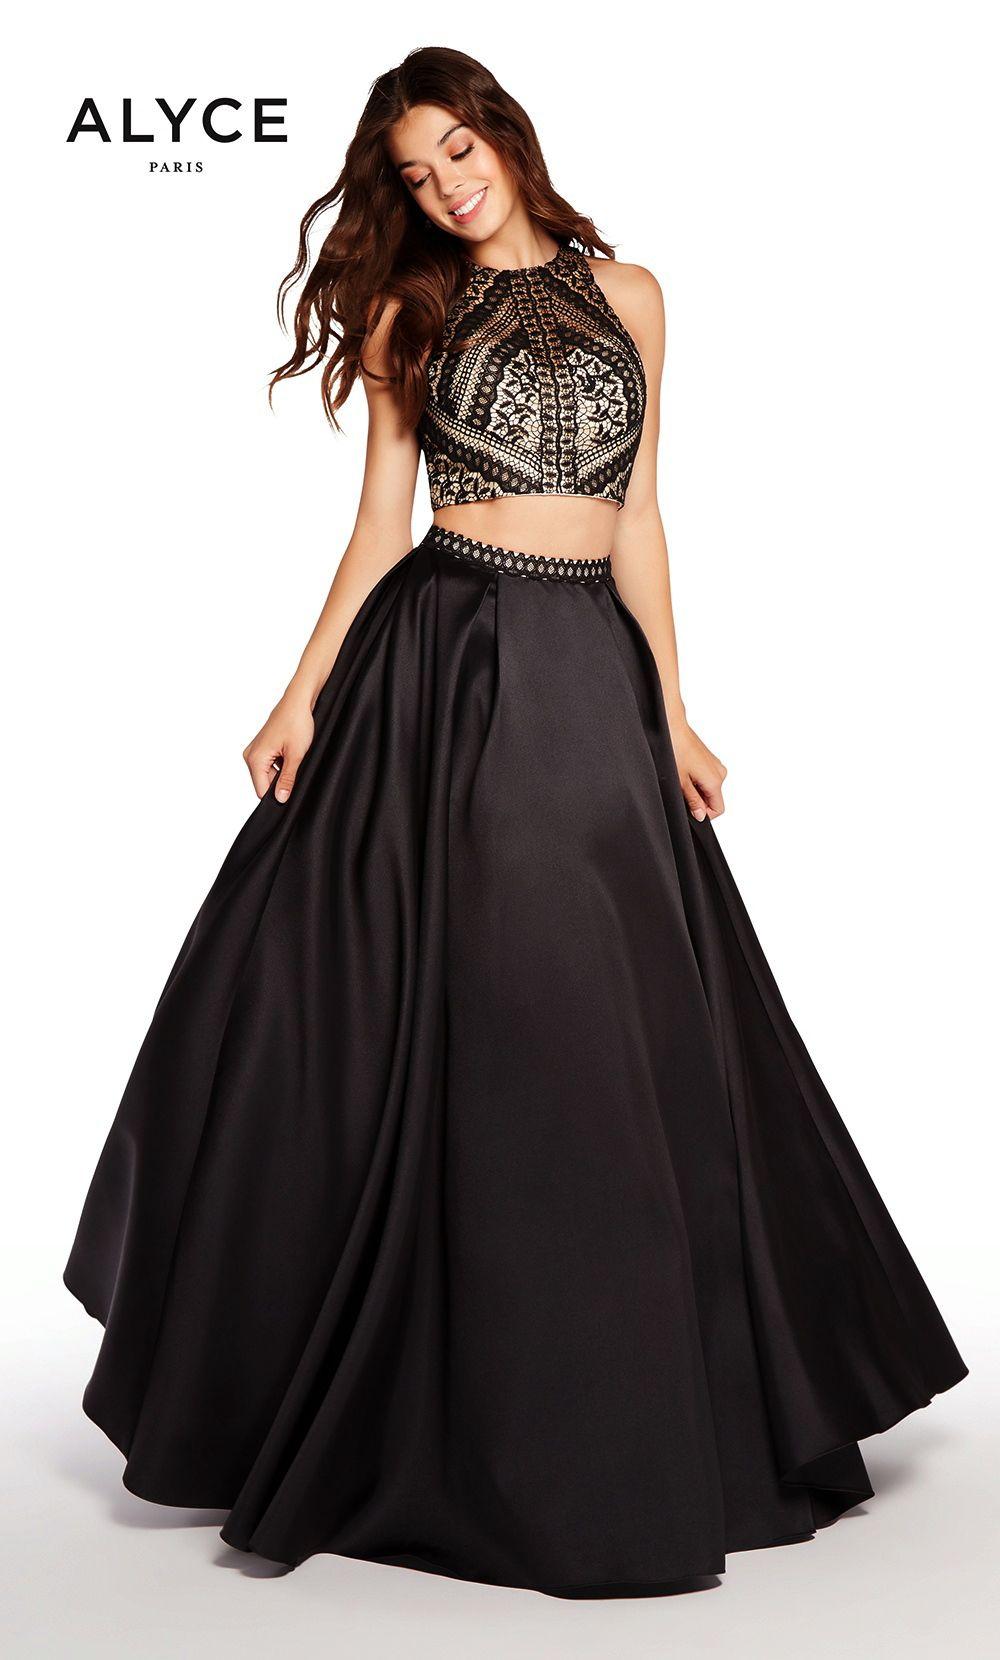 Prom dresses evening dresses by alyce parisucbrueaayucbruetwo piece